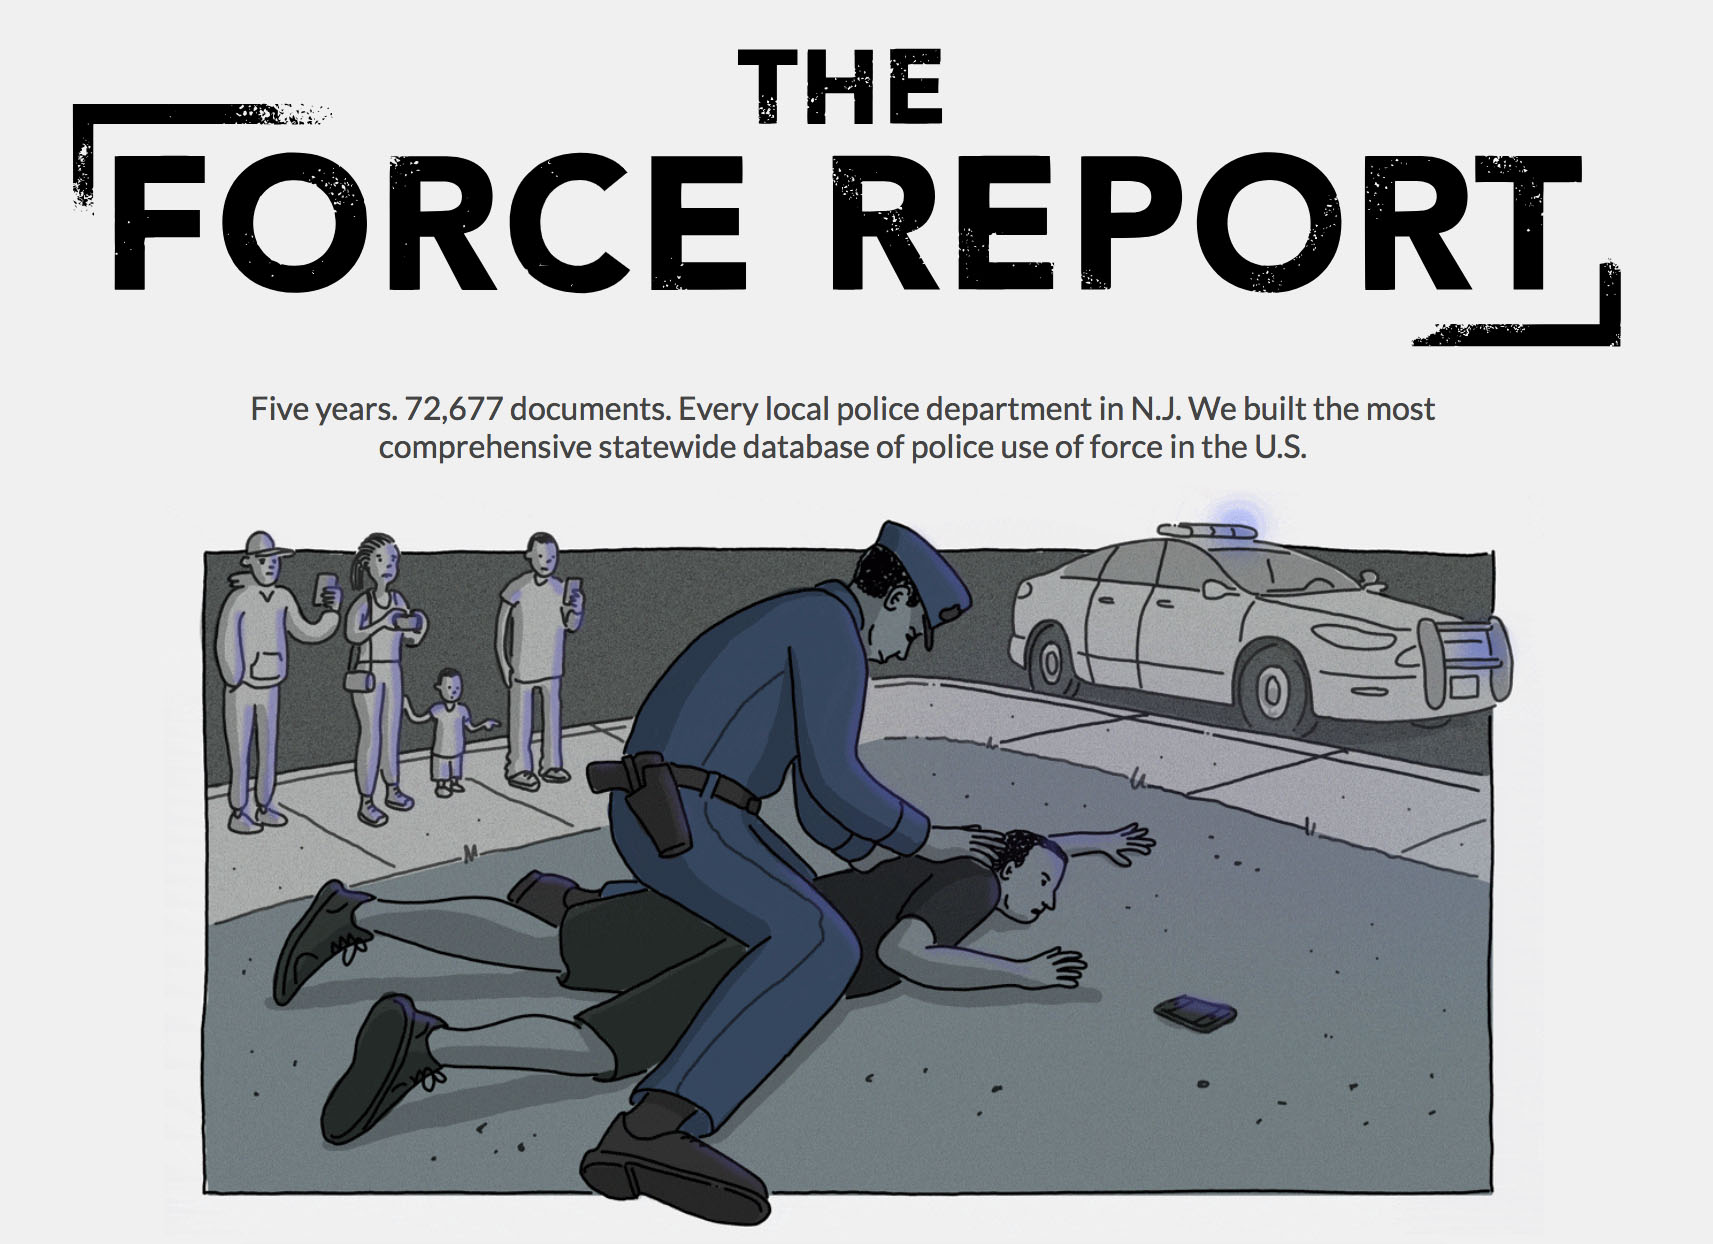 force_report.jpg